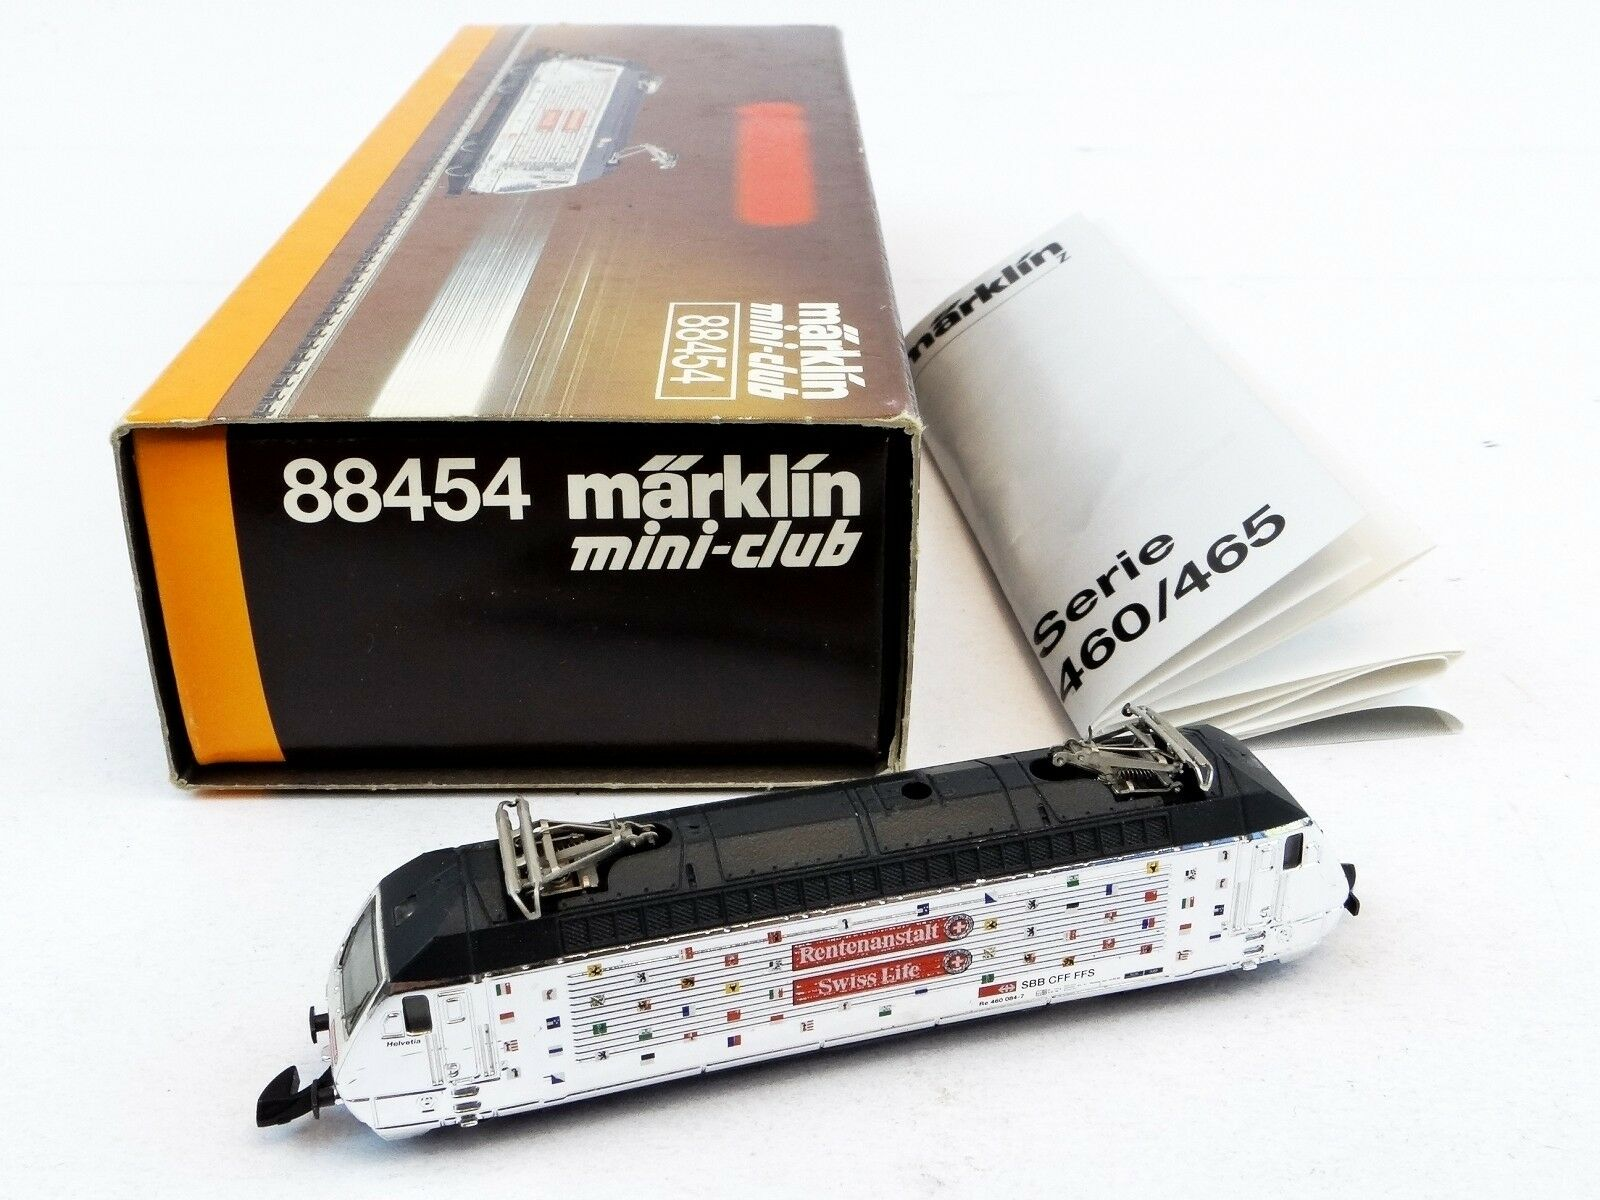 Märklin 88454 mini-club e-Lok serie 460 SBB pensioni manicomio analogico 1 220 Traccia Z